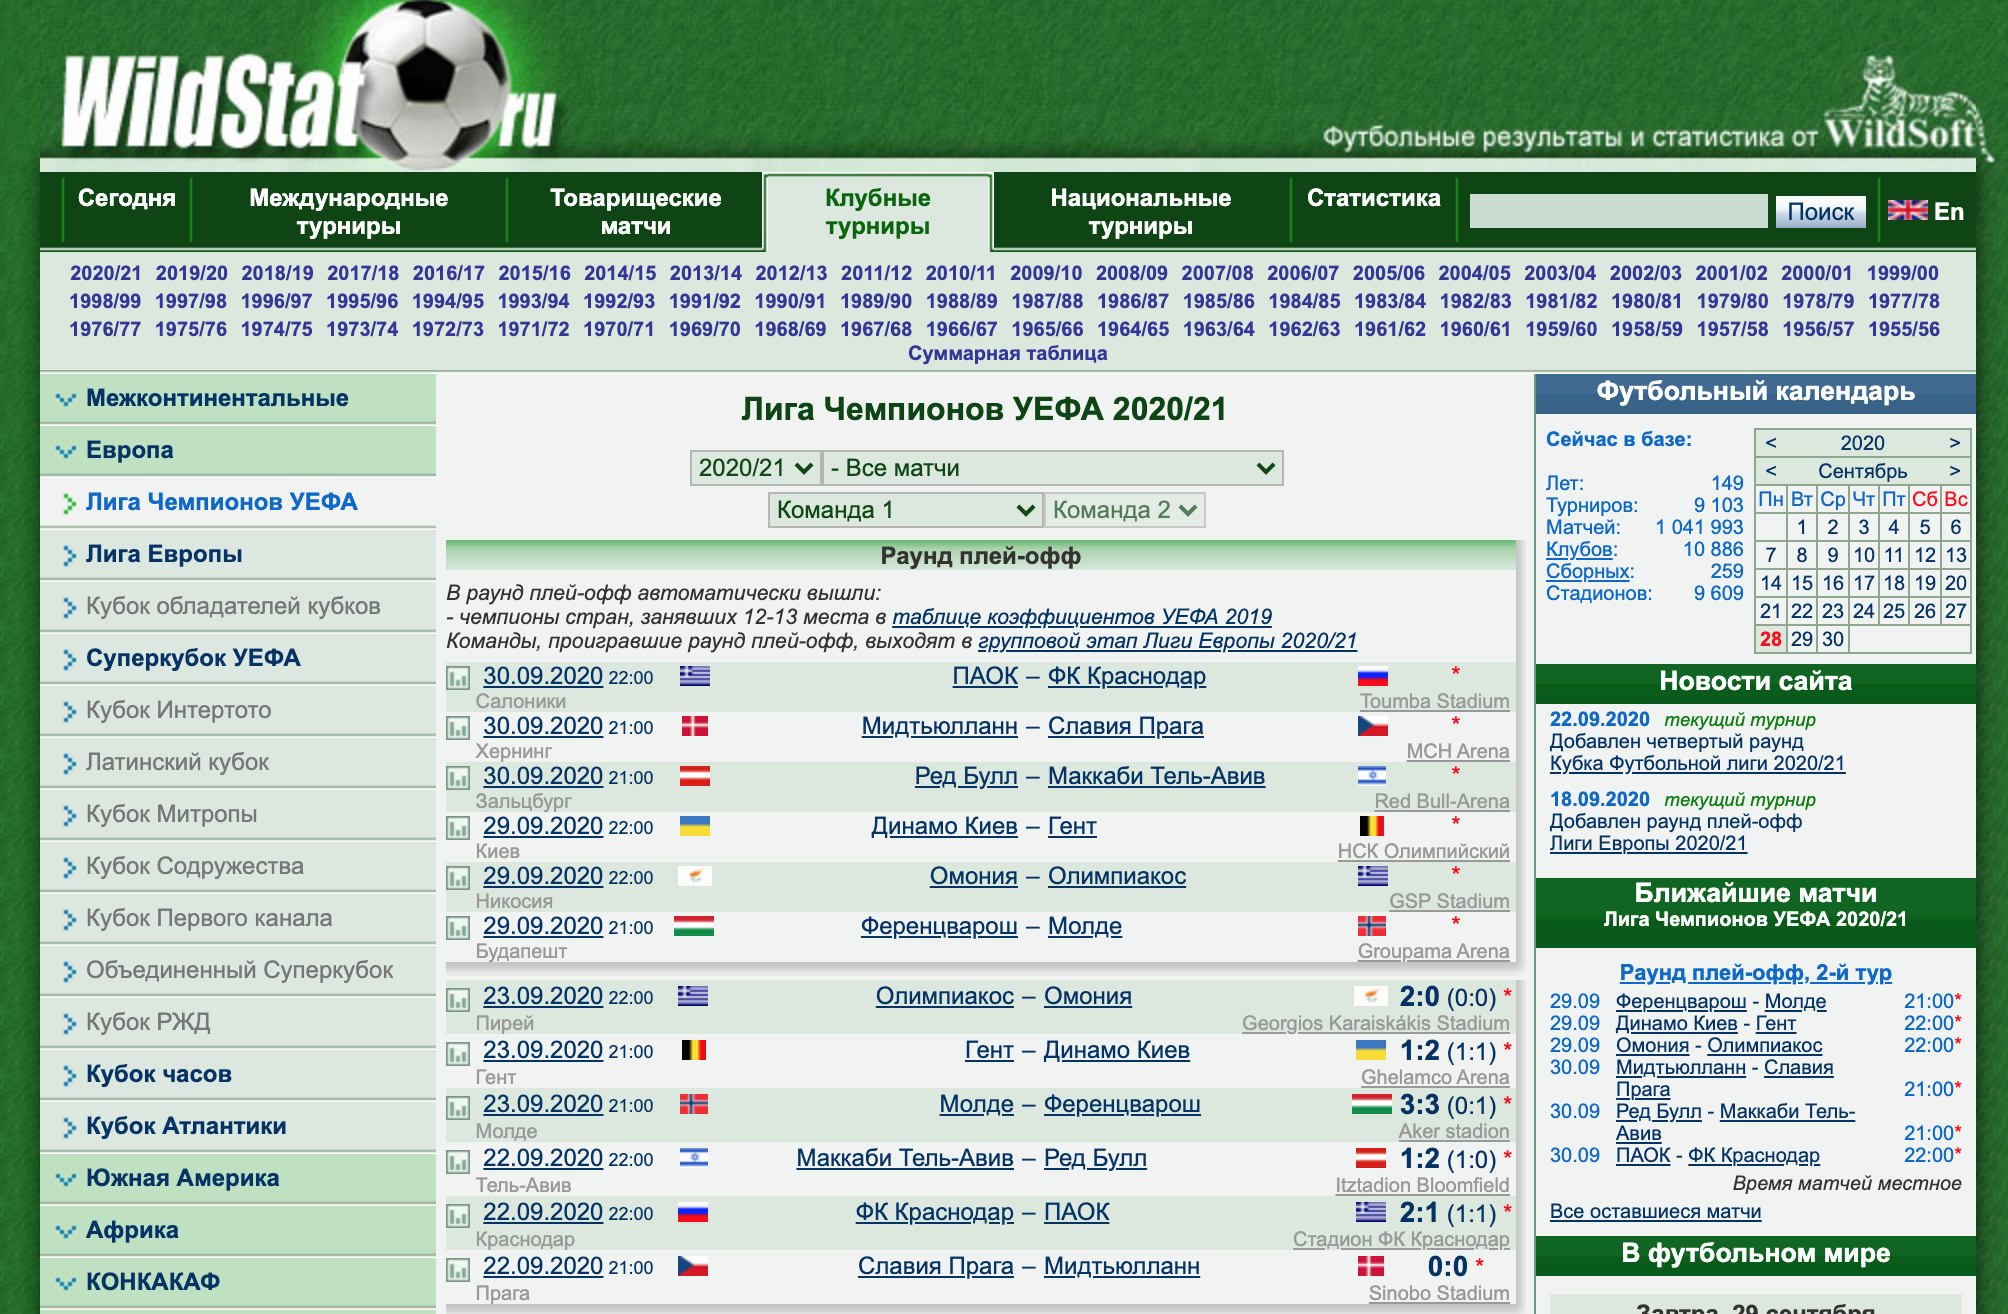 Клубные матчи Wildstat.ru